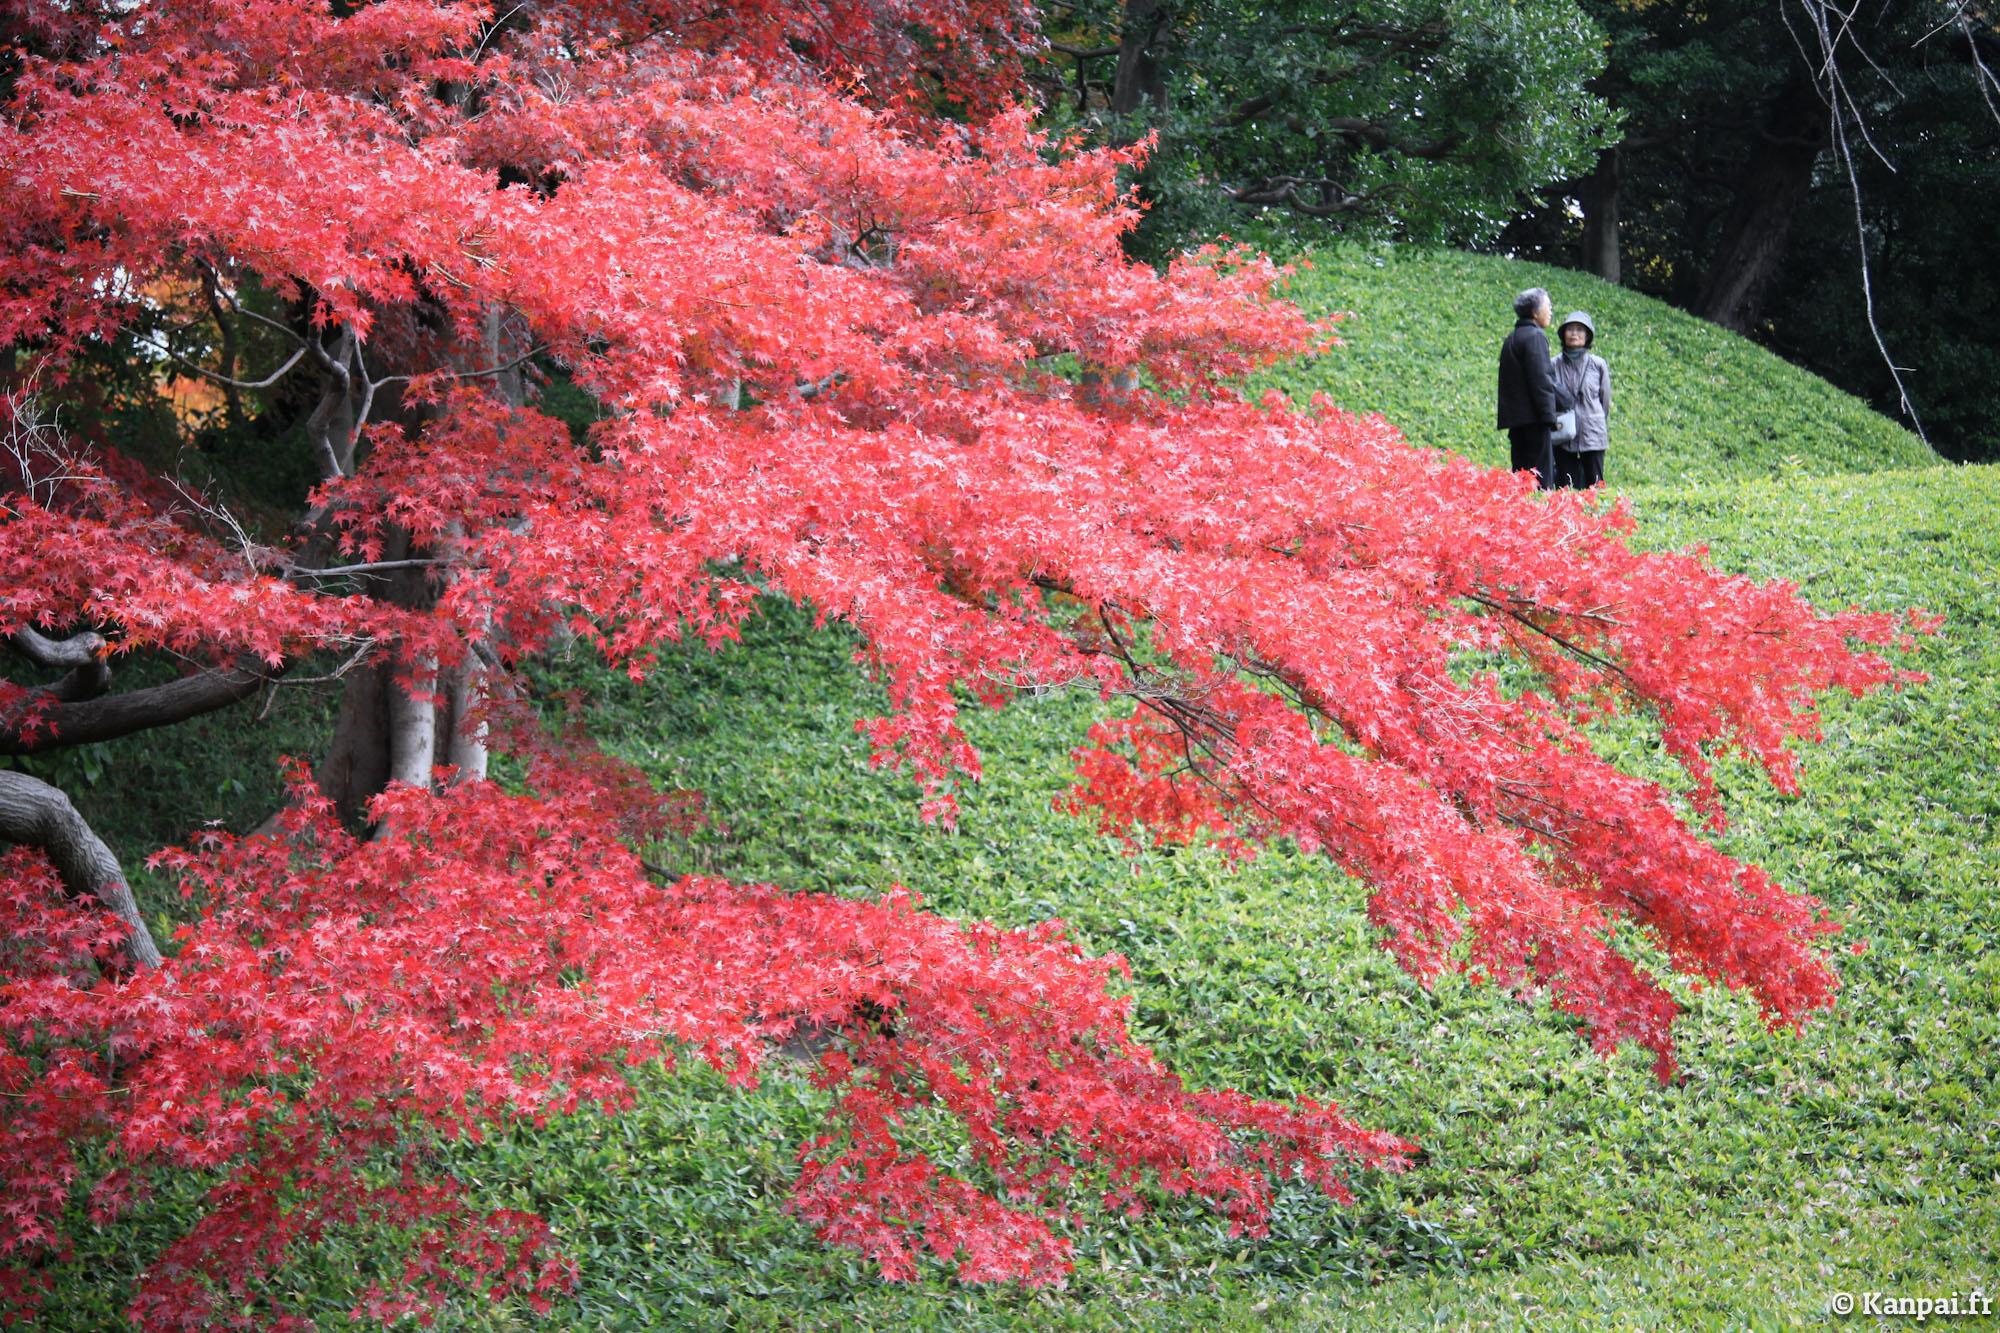 Koishikawa korakuen le jardin japonais de tokyo dome for Portique de jardin japonais